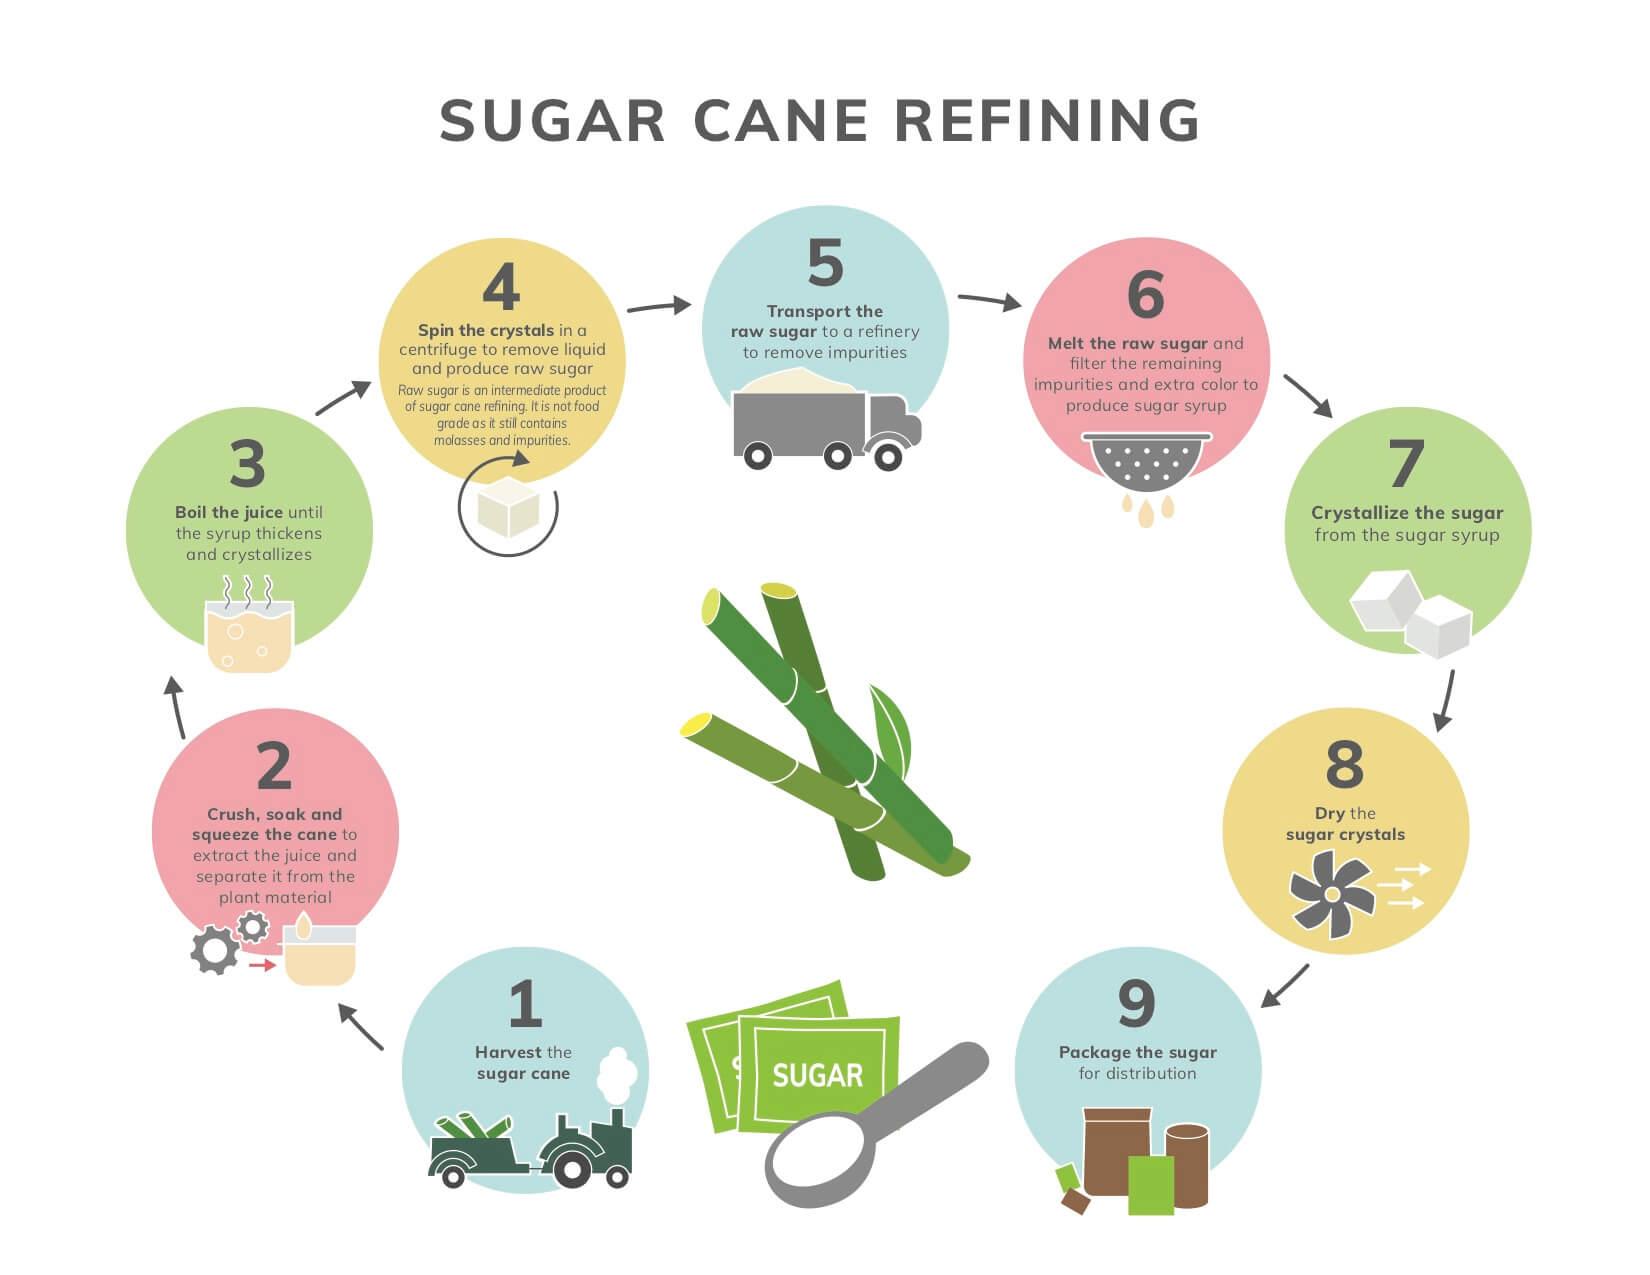 Sugar Cane Refining Infographic